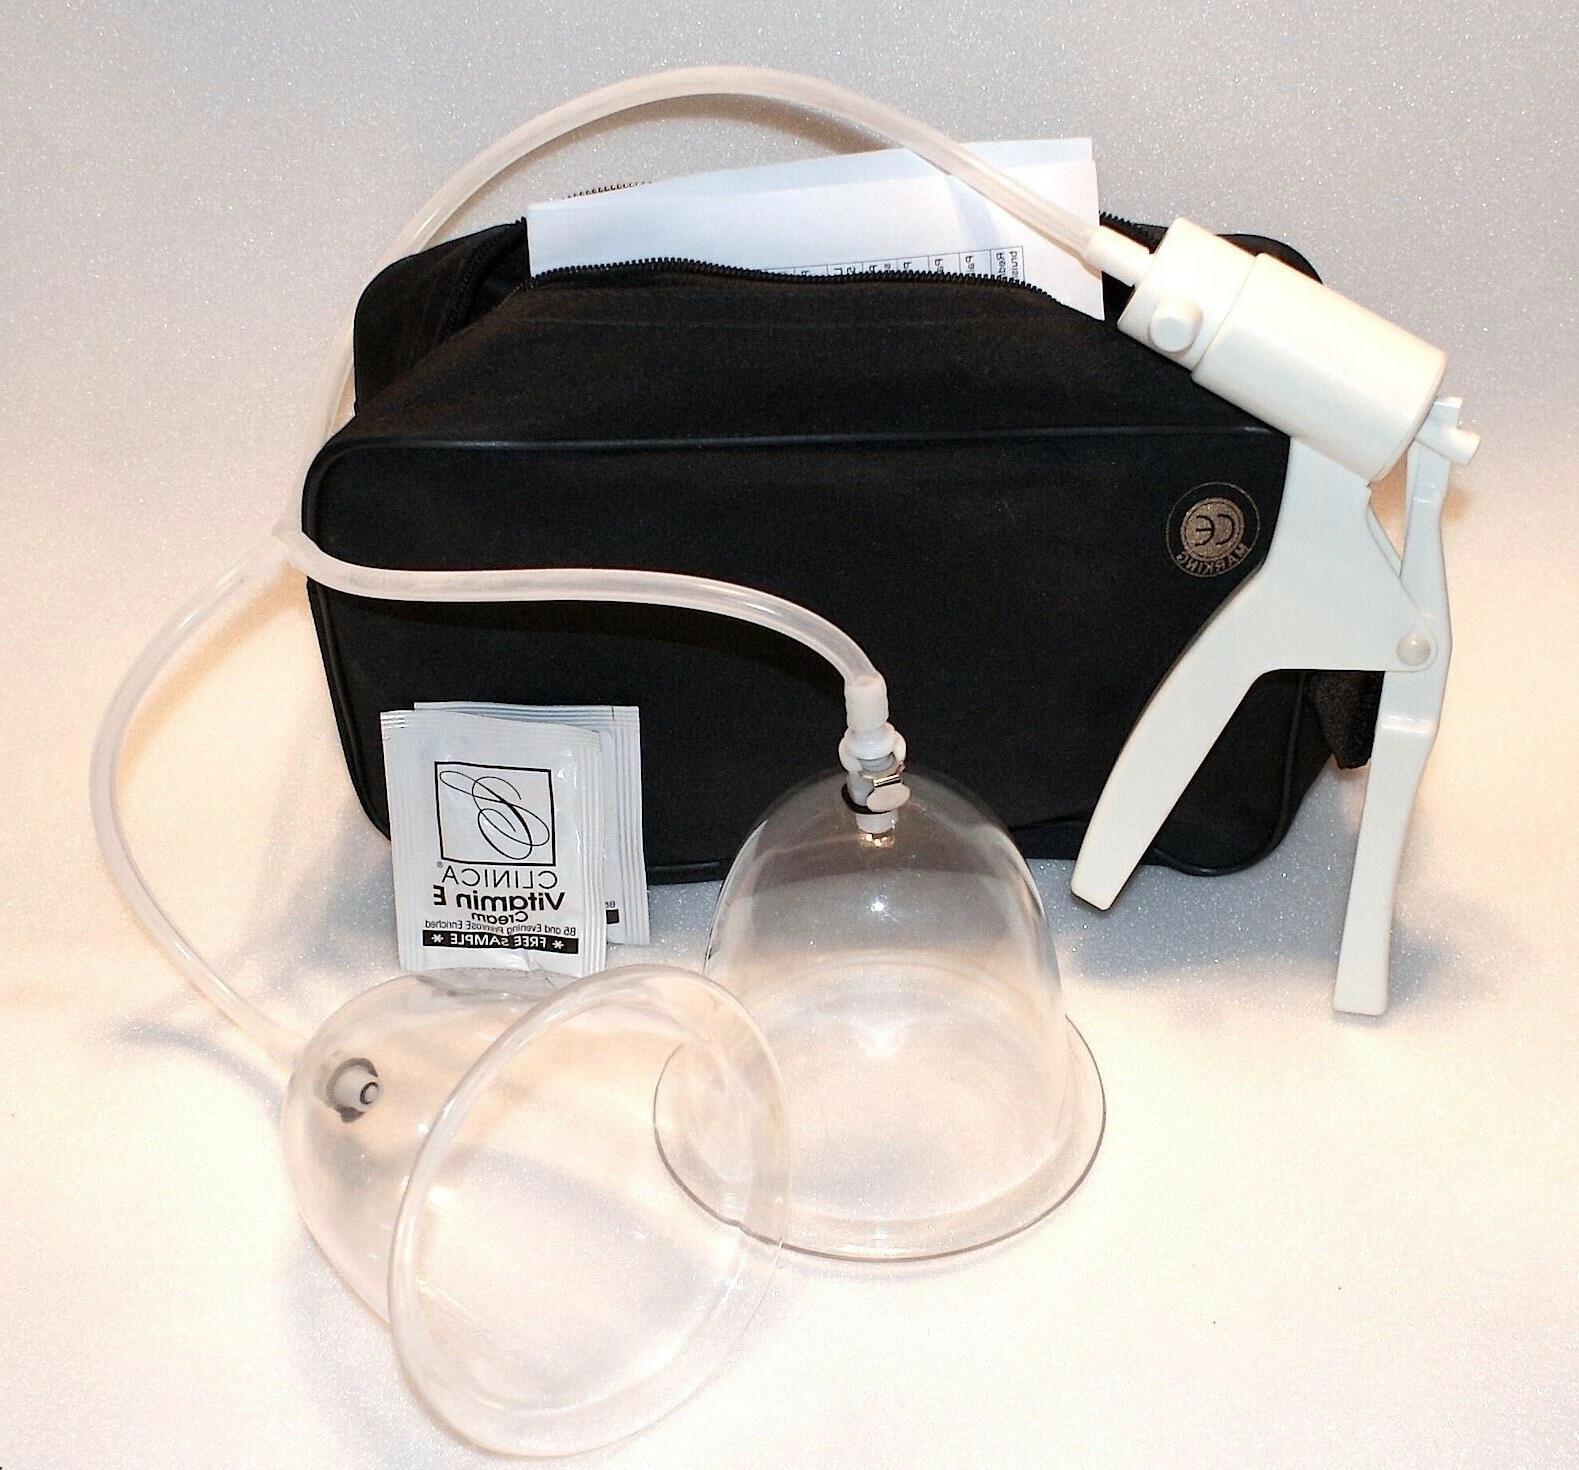 breast enhancement system breast pump natural